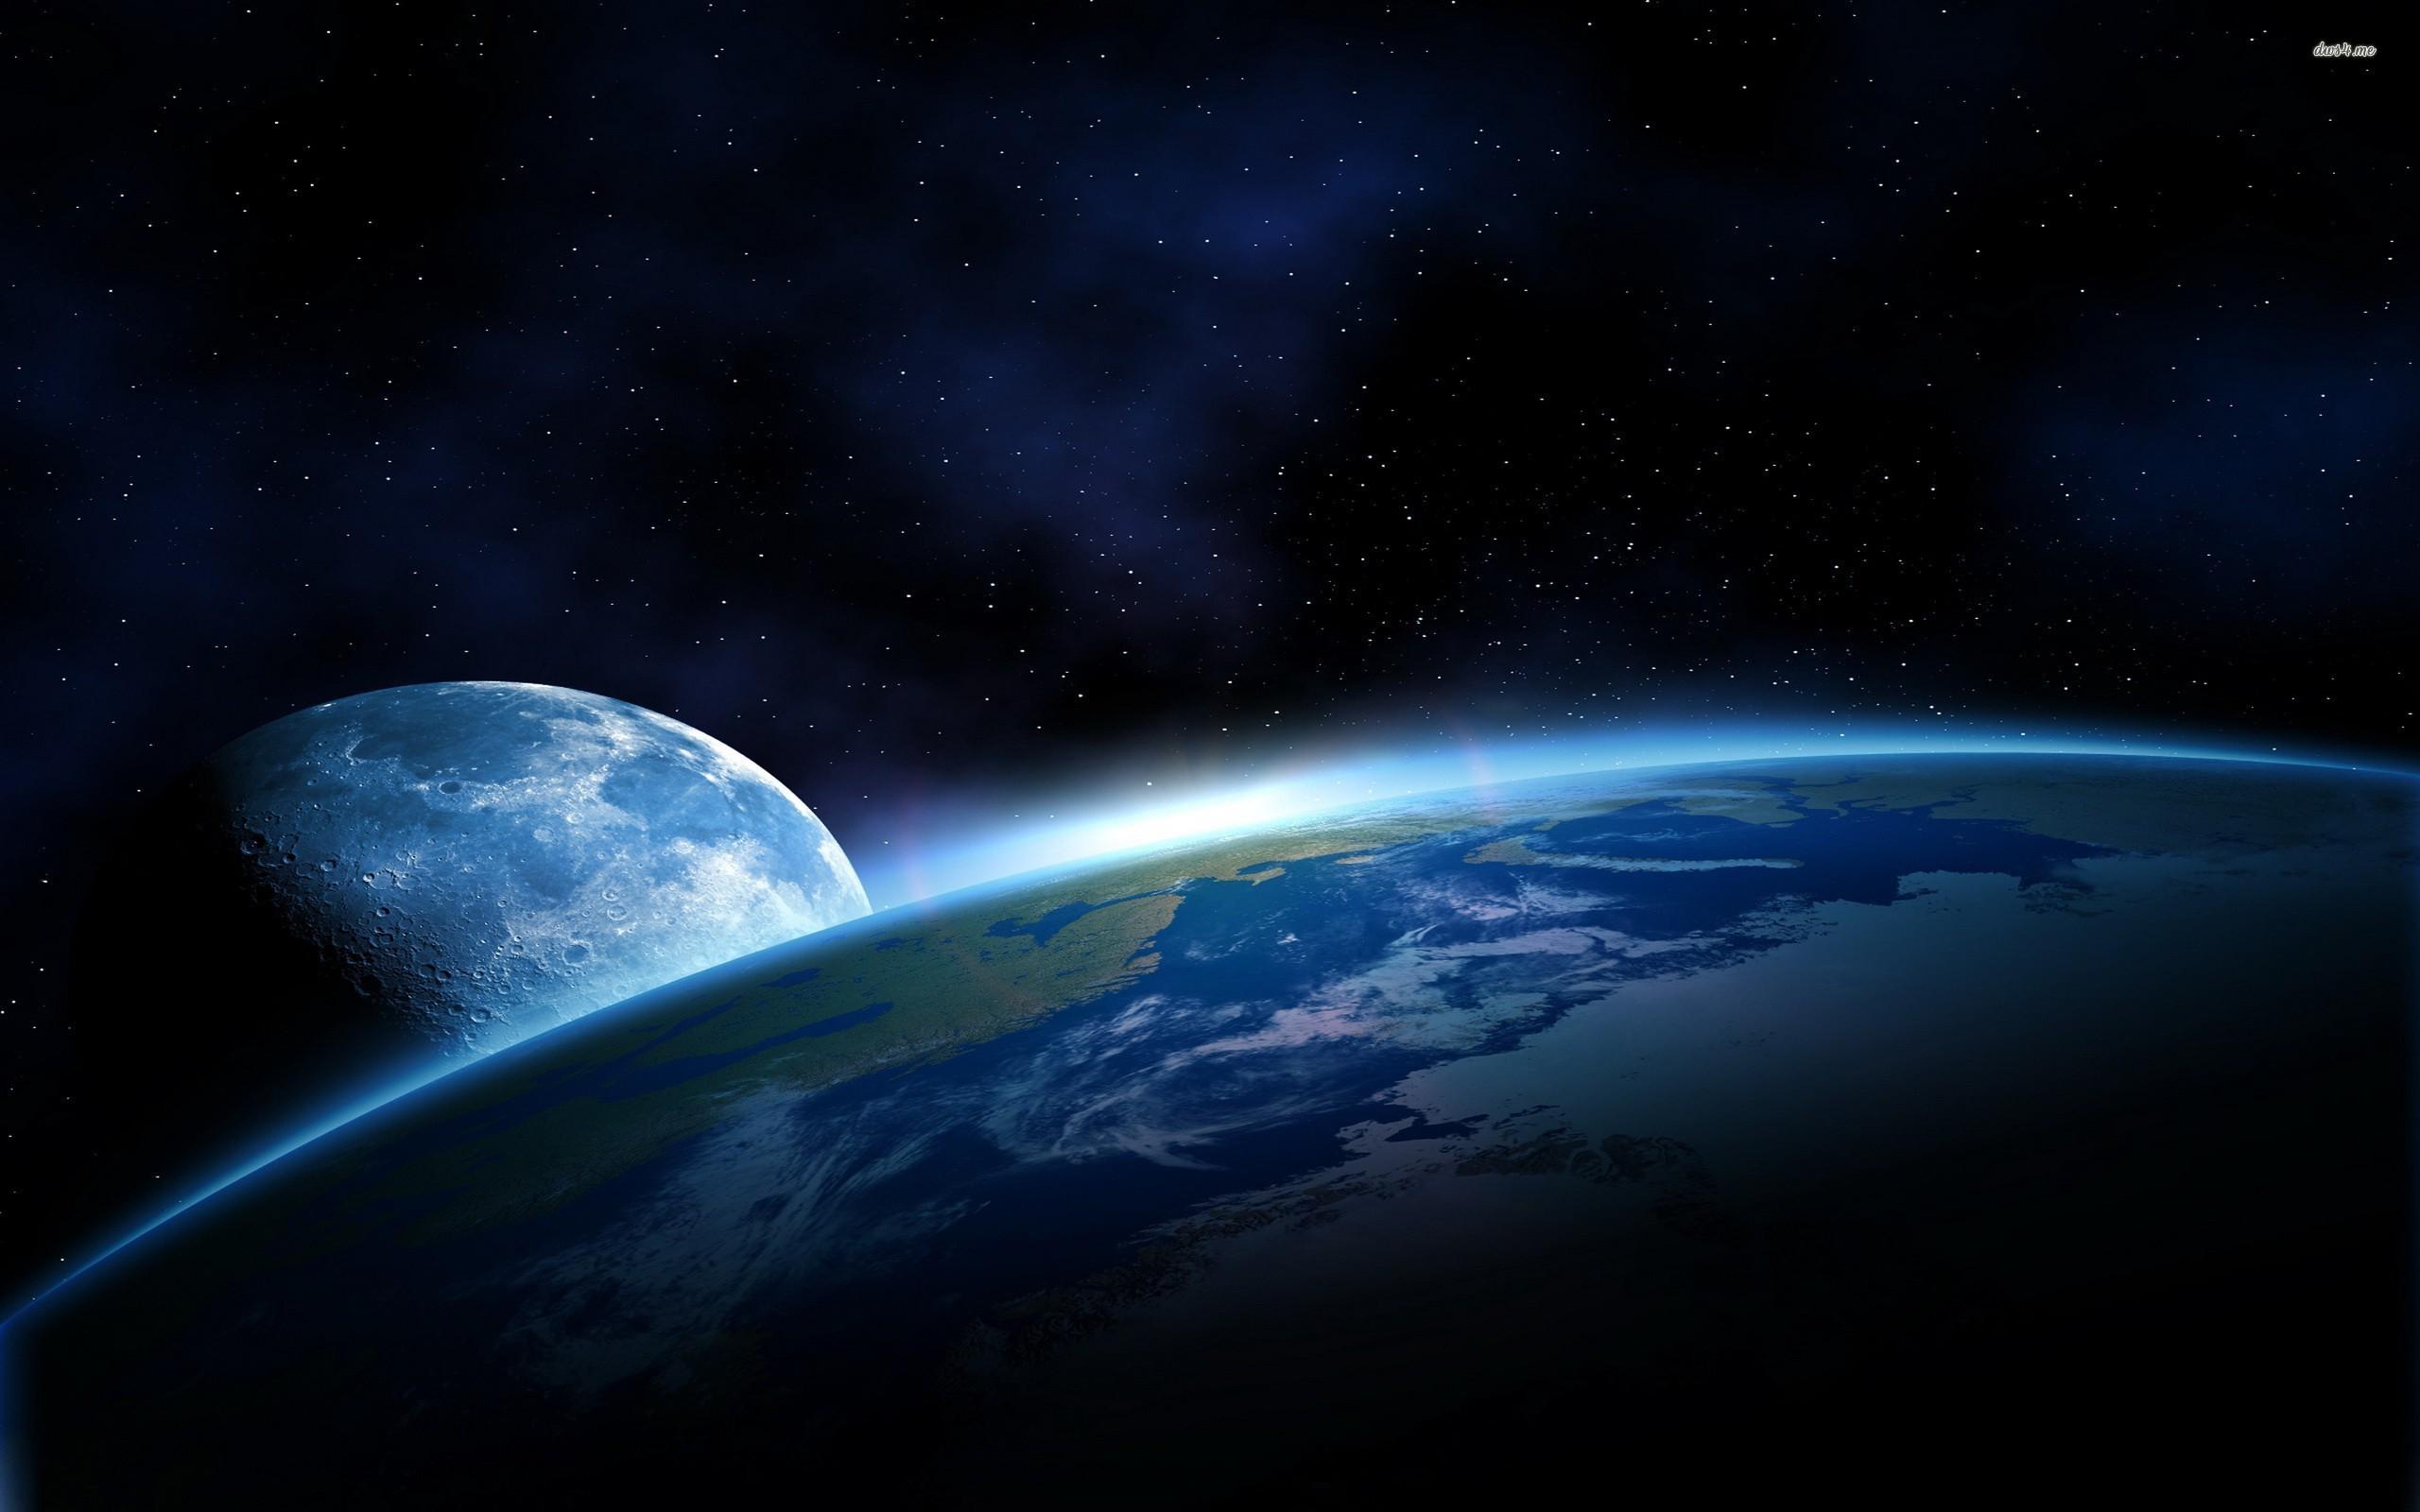 Moon photos from earth dowload 2560x1600